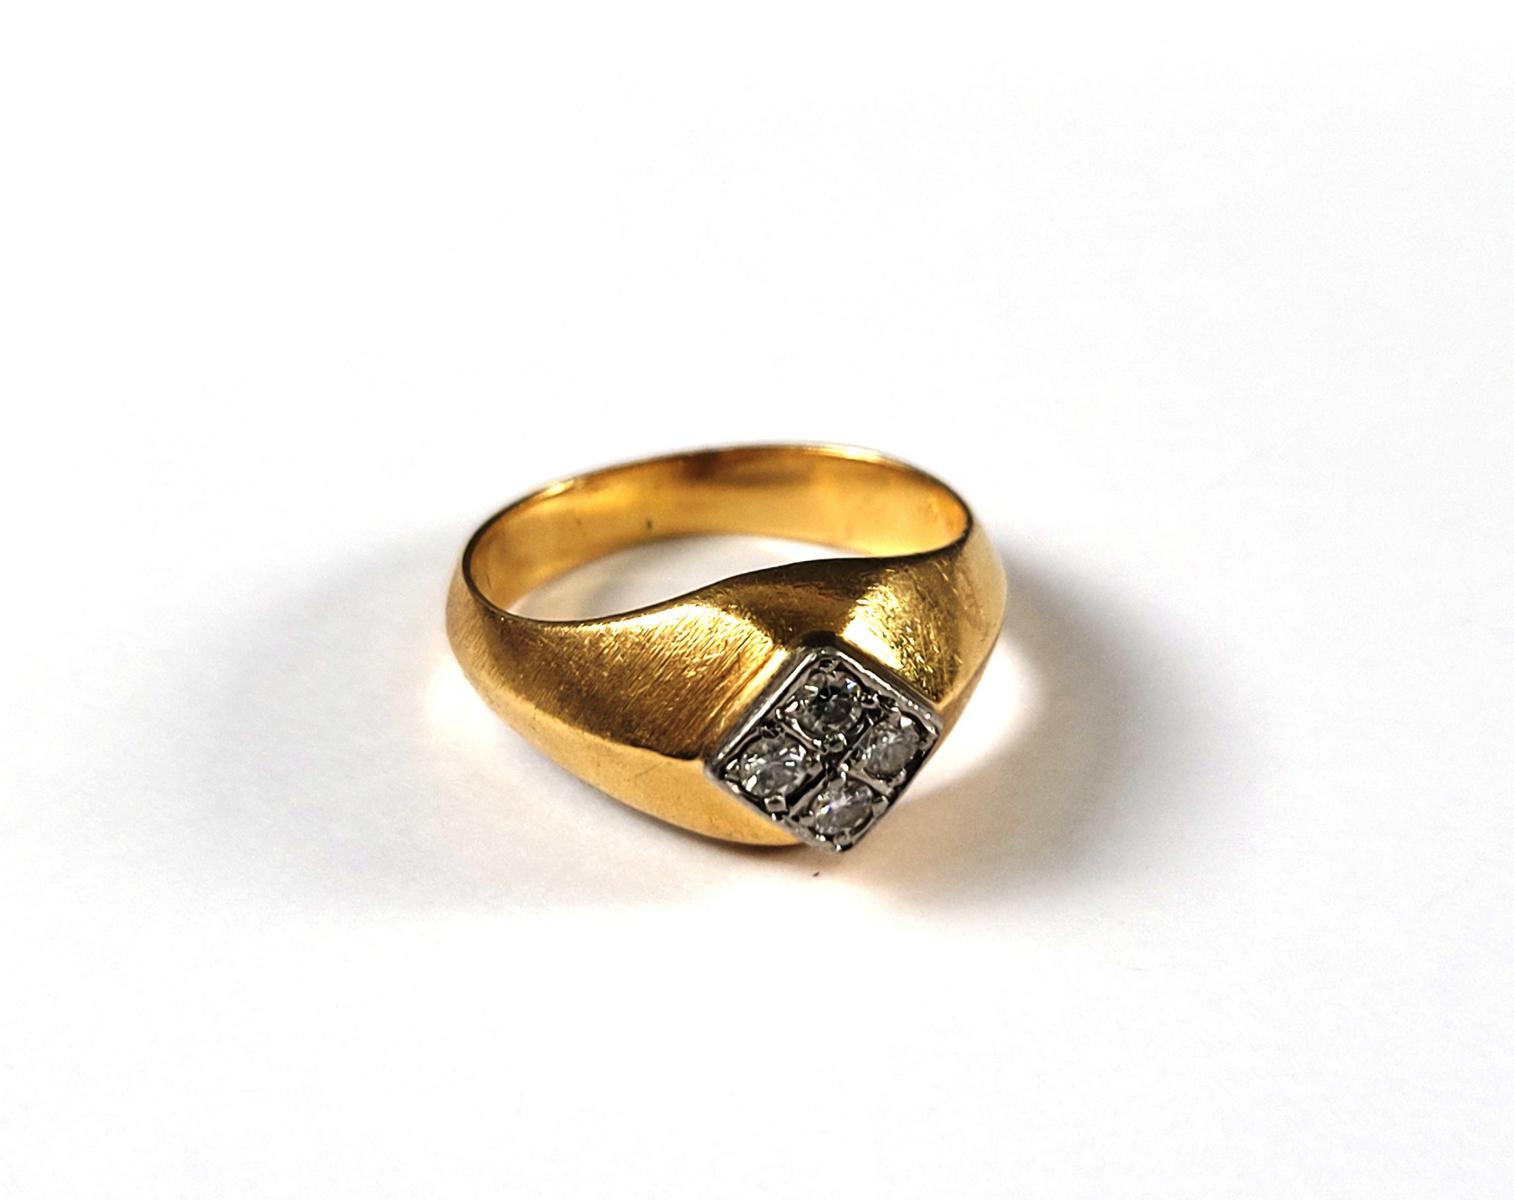 Damenring mit Diamanten, 18 Karat Gelbgold